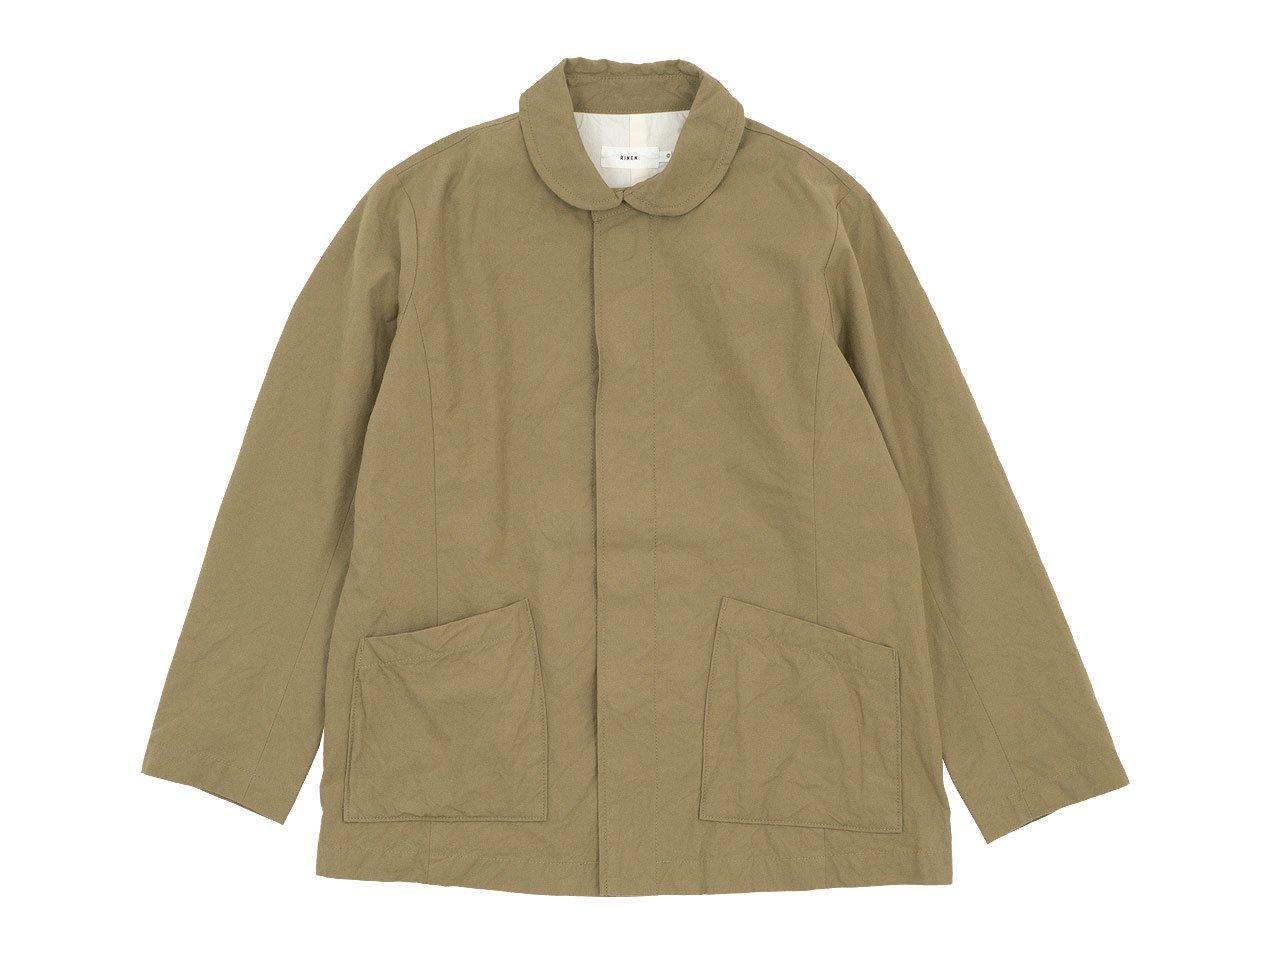 RINEN 40/2高密度平織 ガーデンジャケット 06ベージュ 〔レディース〕